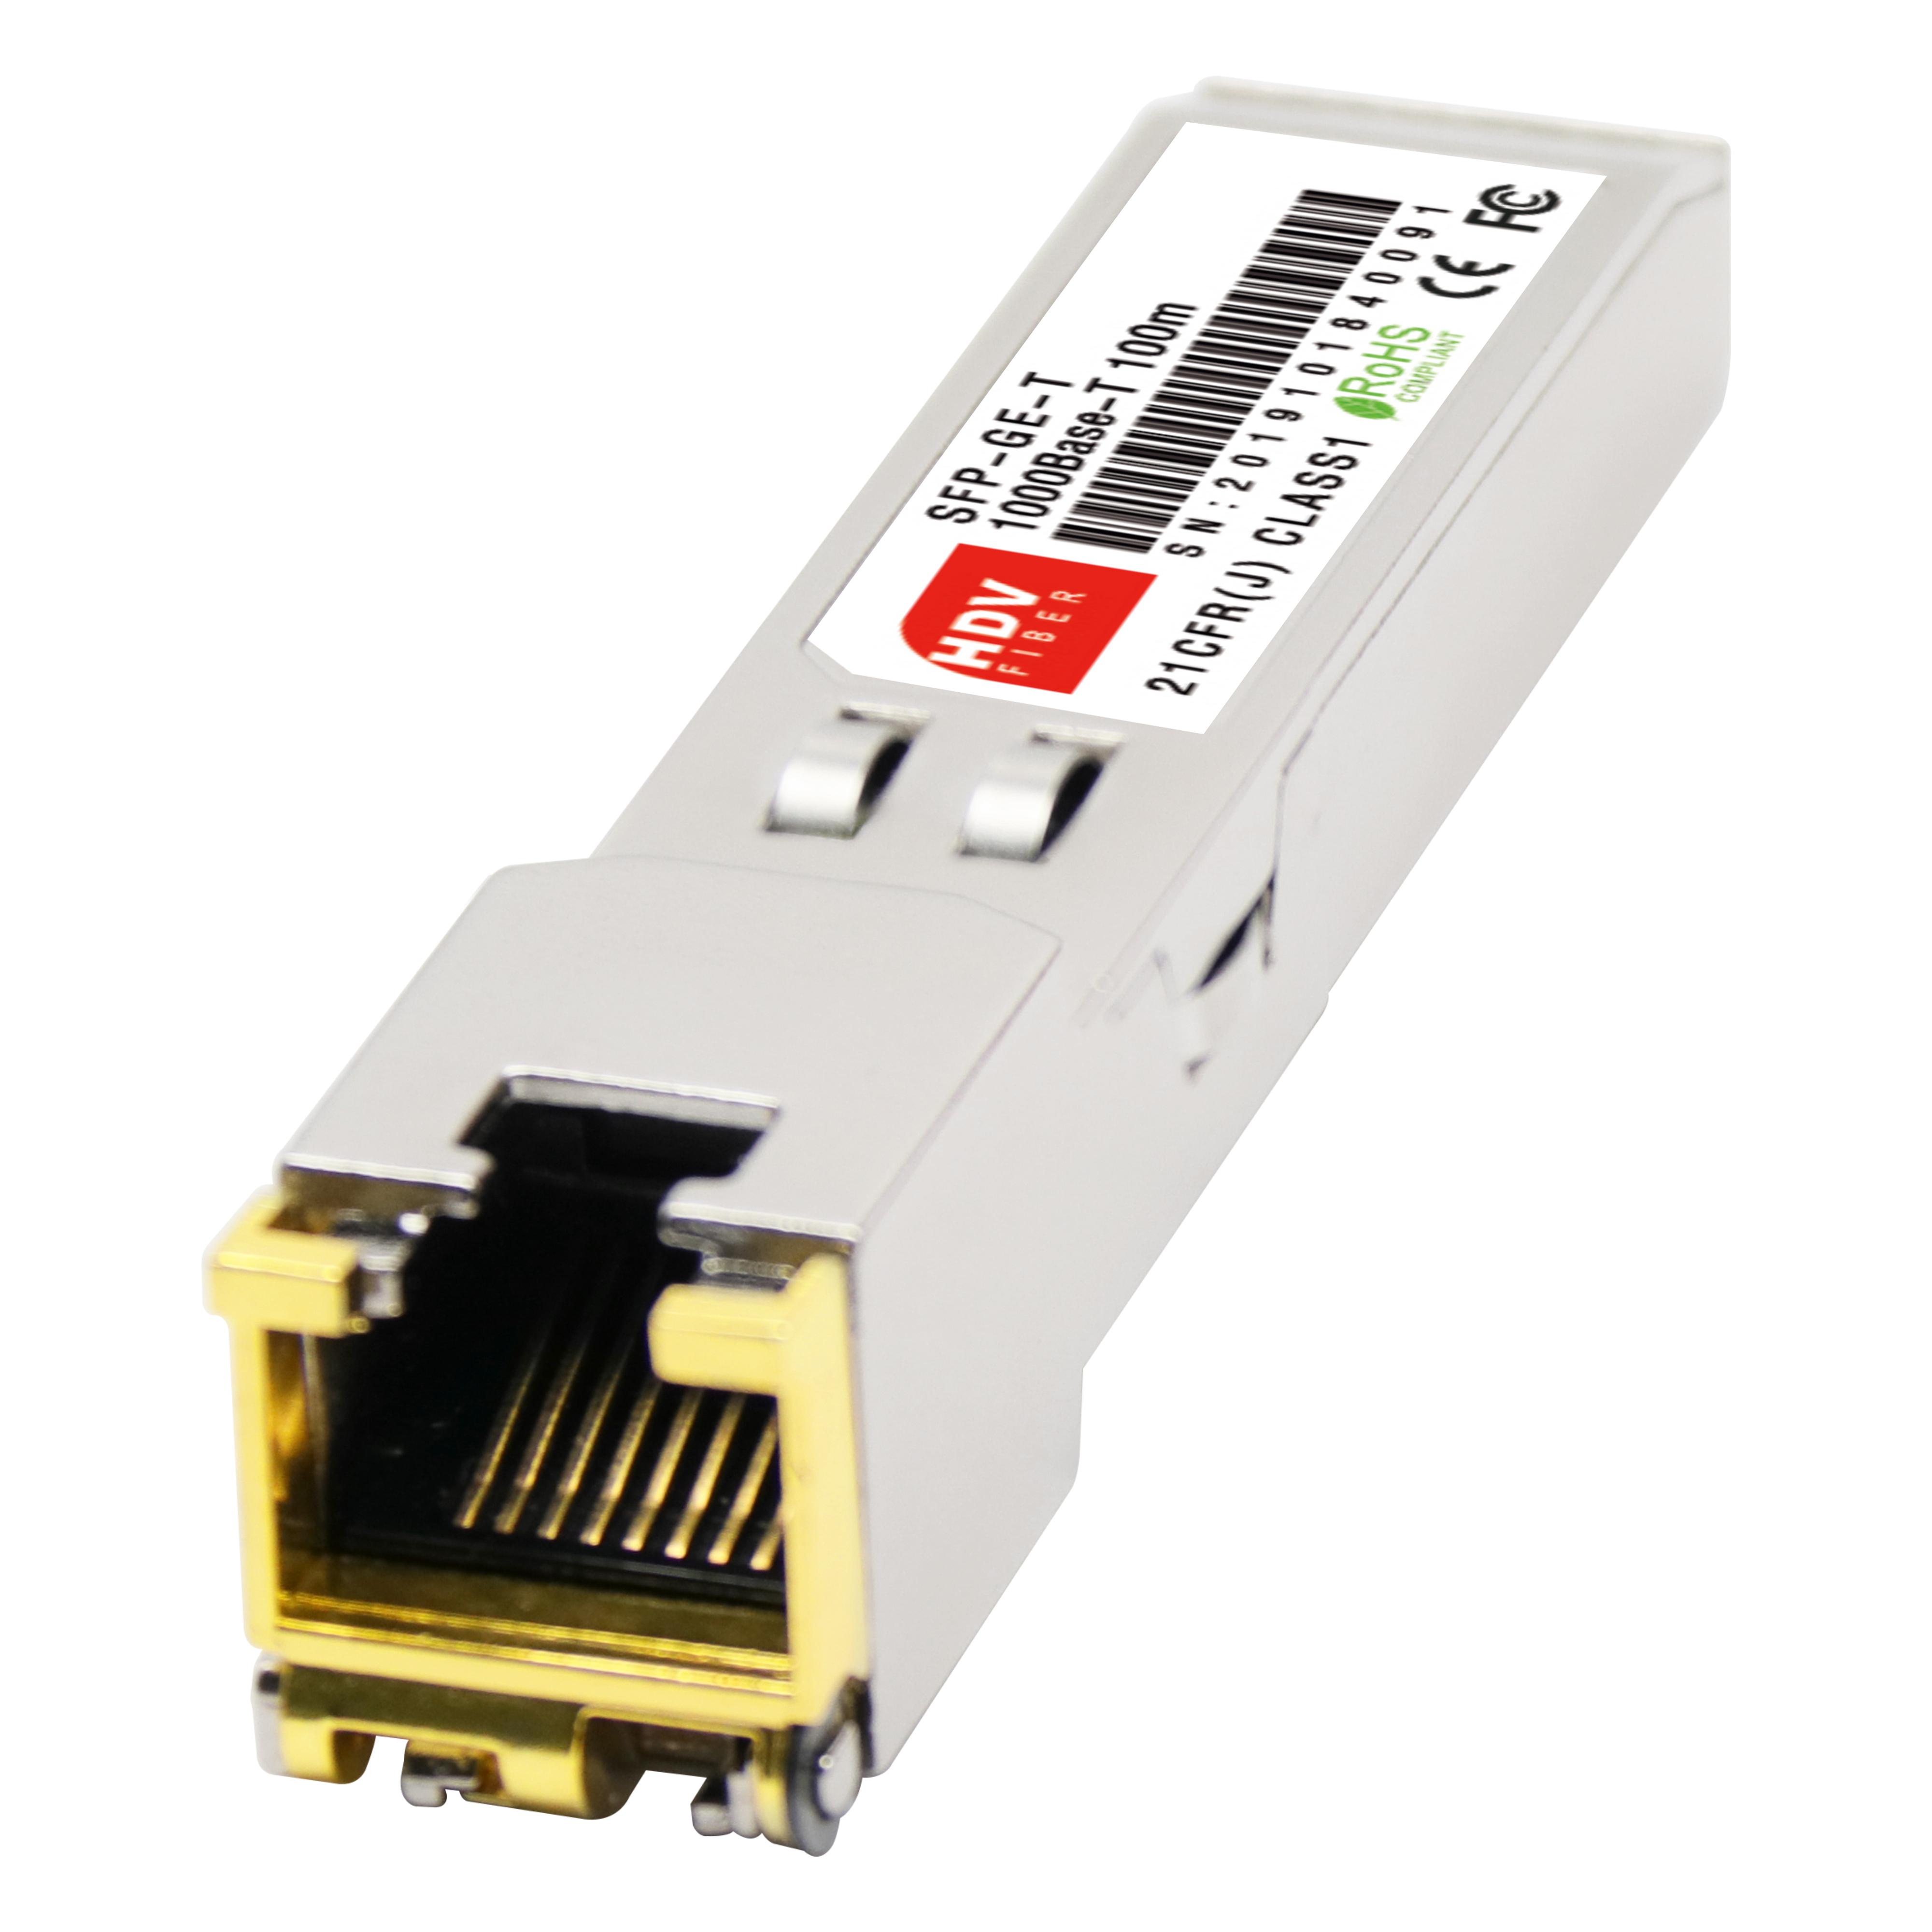 Copper Sfp Module 1000base-t Sfp Rj45 100m Optical Transceiver Compatible  With Cisco - Buy Sfp Copper,1000base-t Sfp,Sfp Copper Rj45 Module Product  on